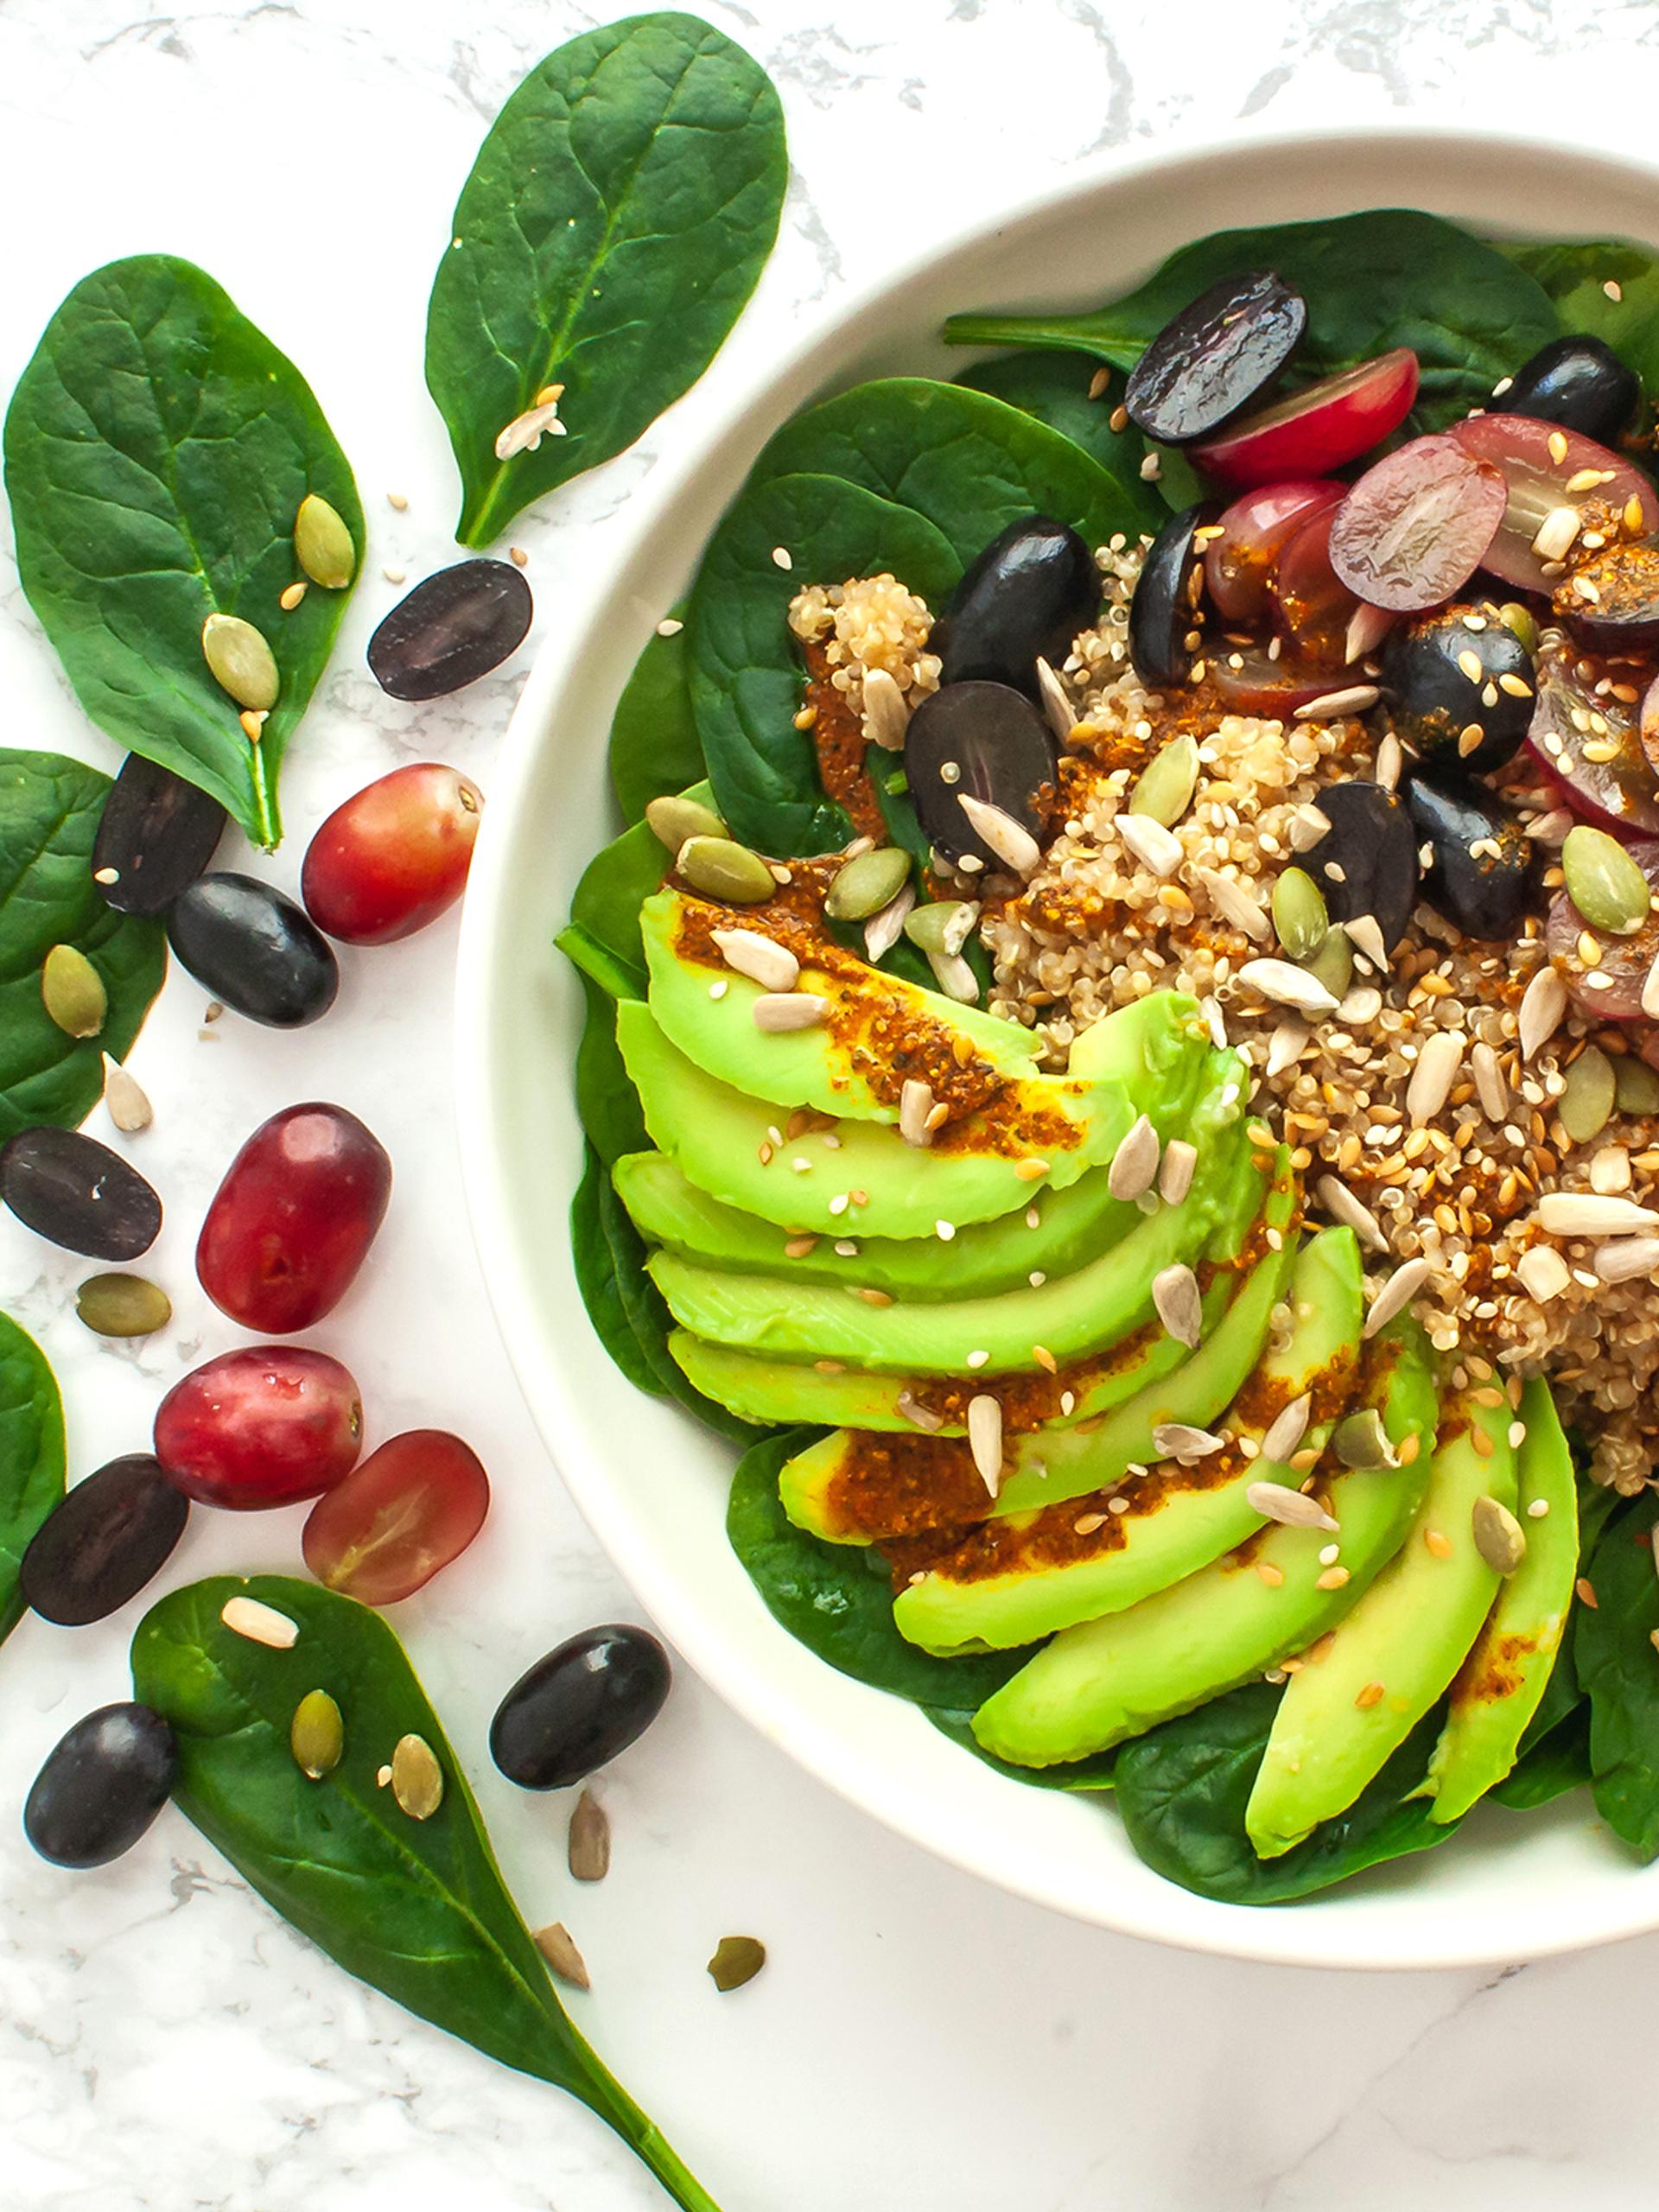 Quinoa Avocado Spinach Salad with Grapes Thumbnail